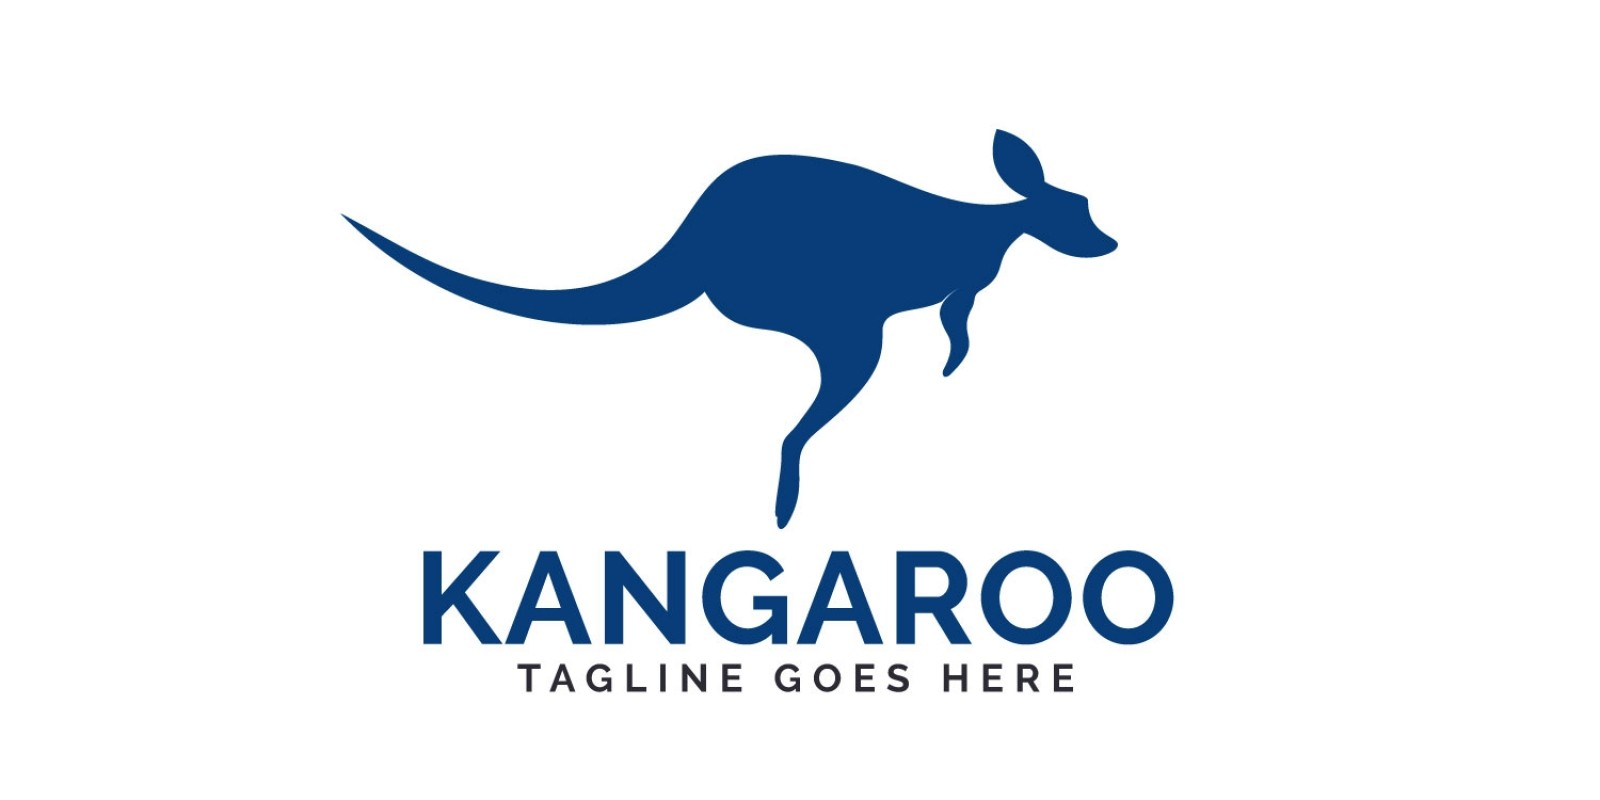 Kangaroo Vector Logo Design